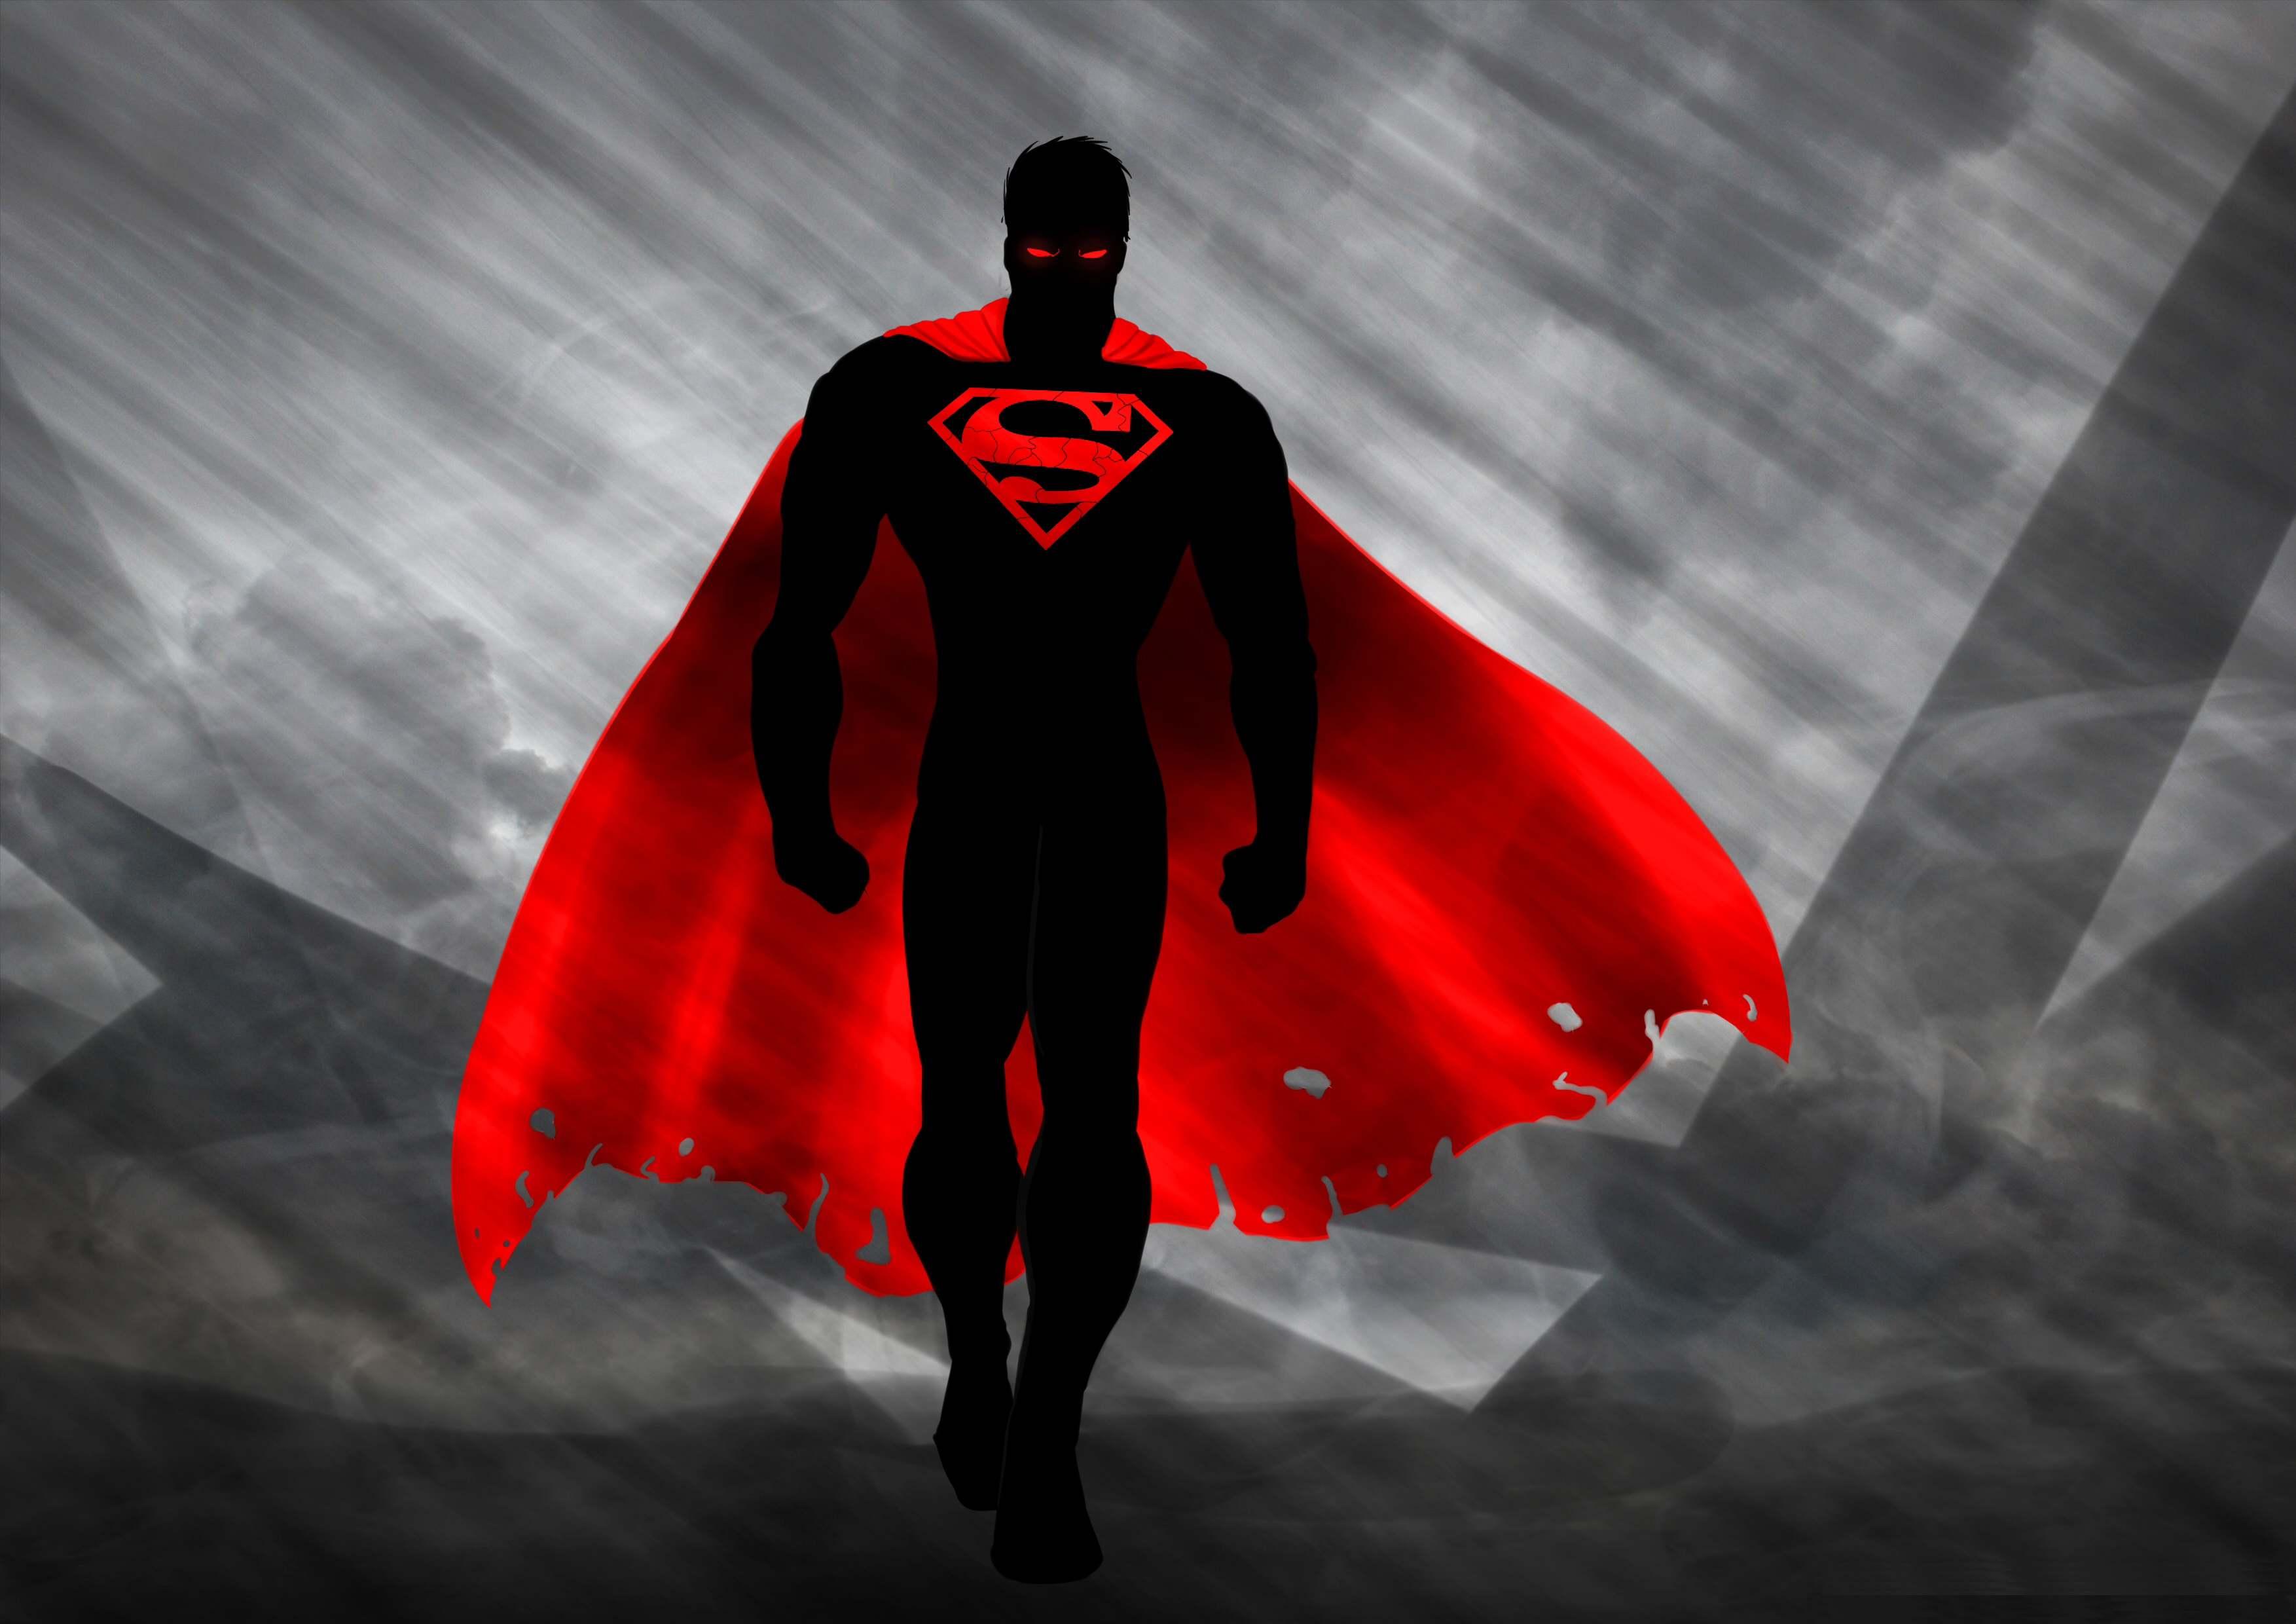 4k Superhero Wallpapers Top Free 4k Superhero Backgrounds Wallpaperaccess